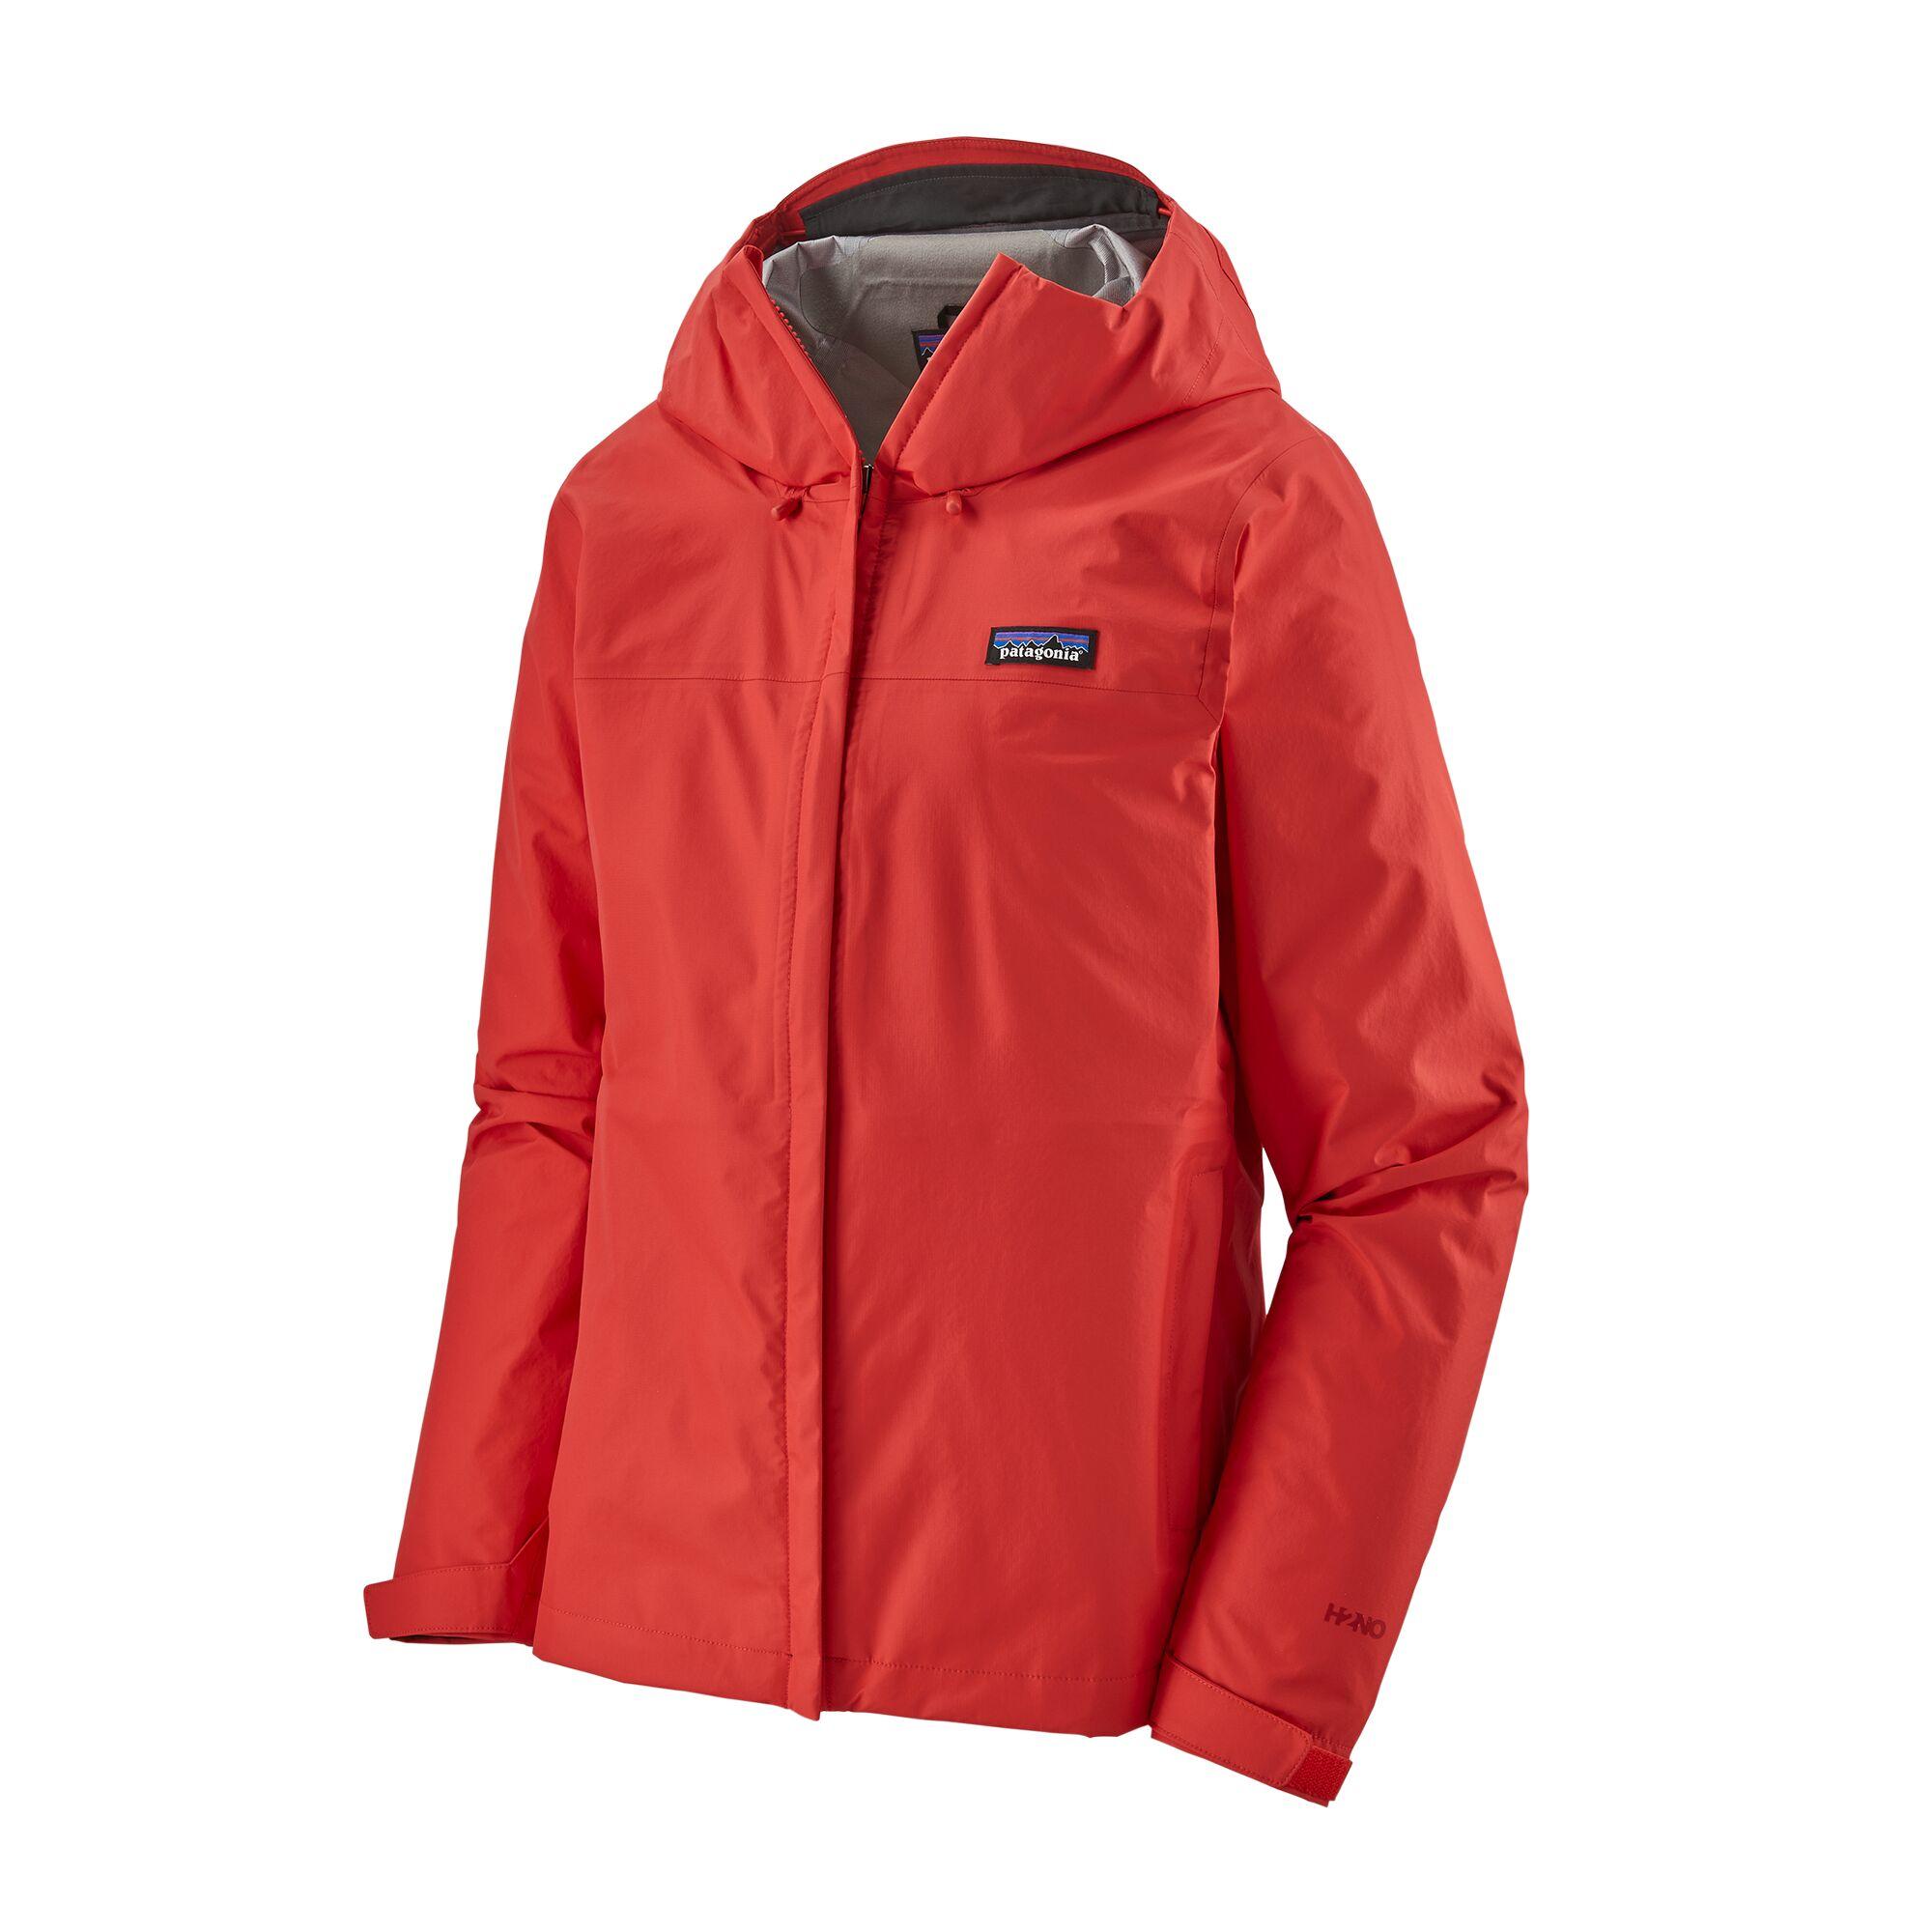 Patagonia Torrentshell 3L Jacket, W's